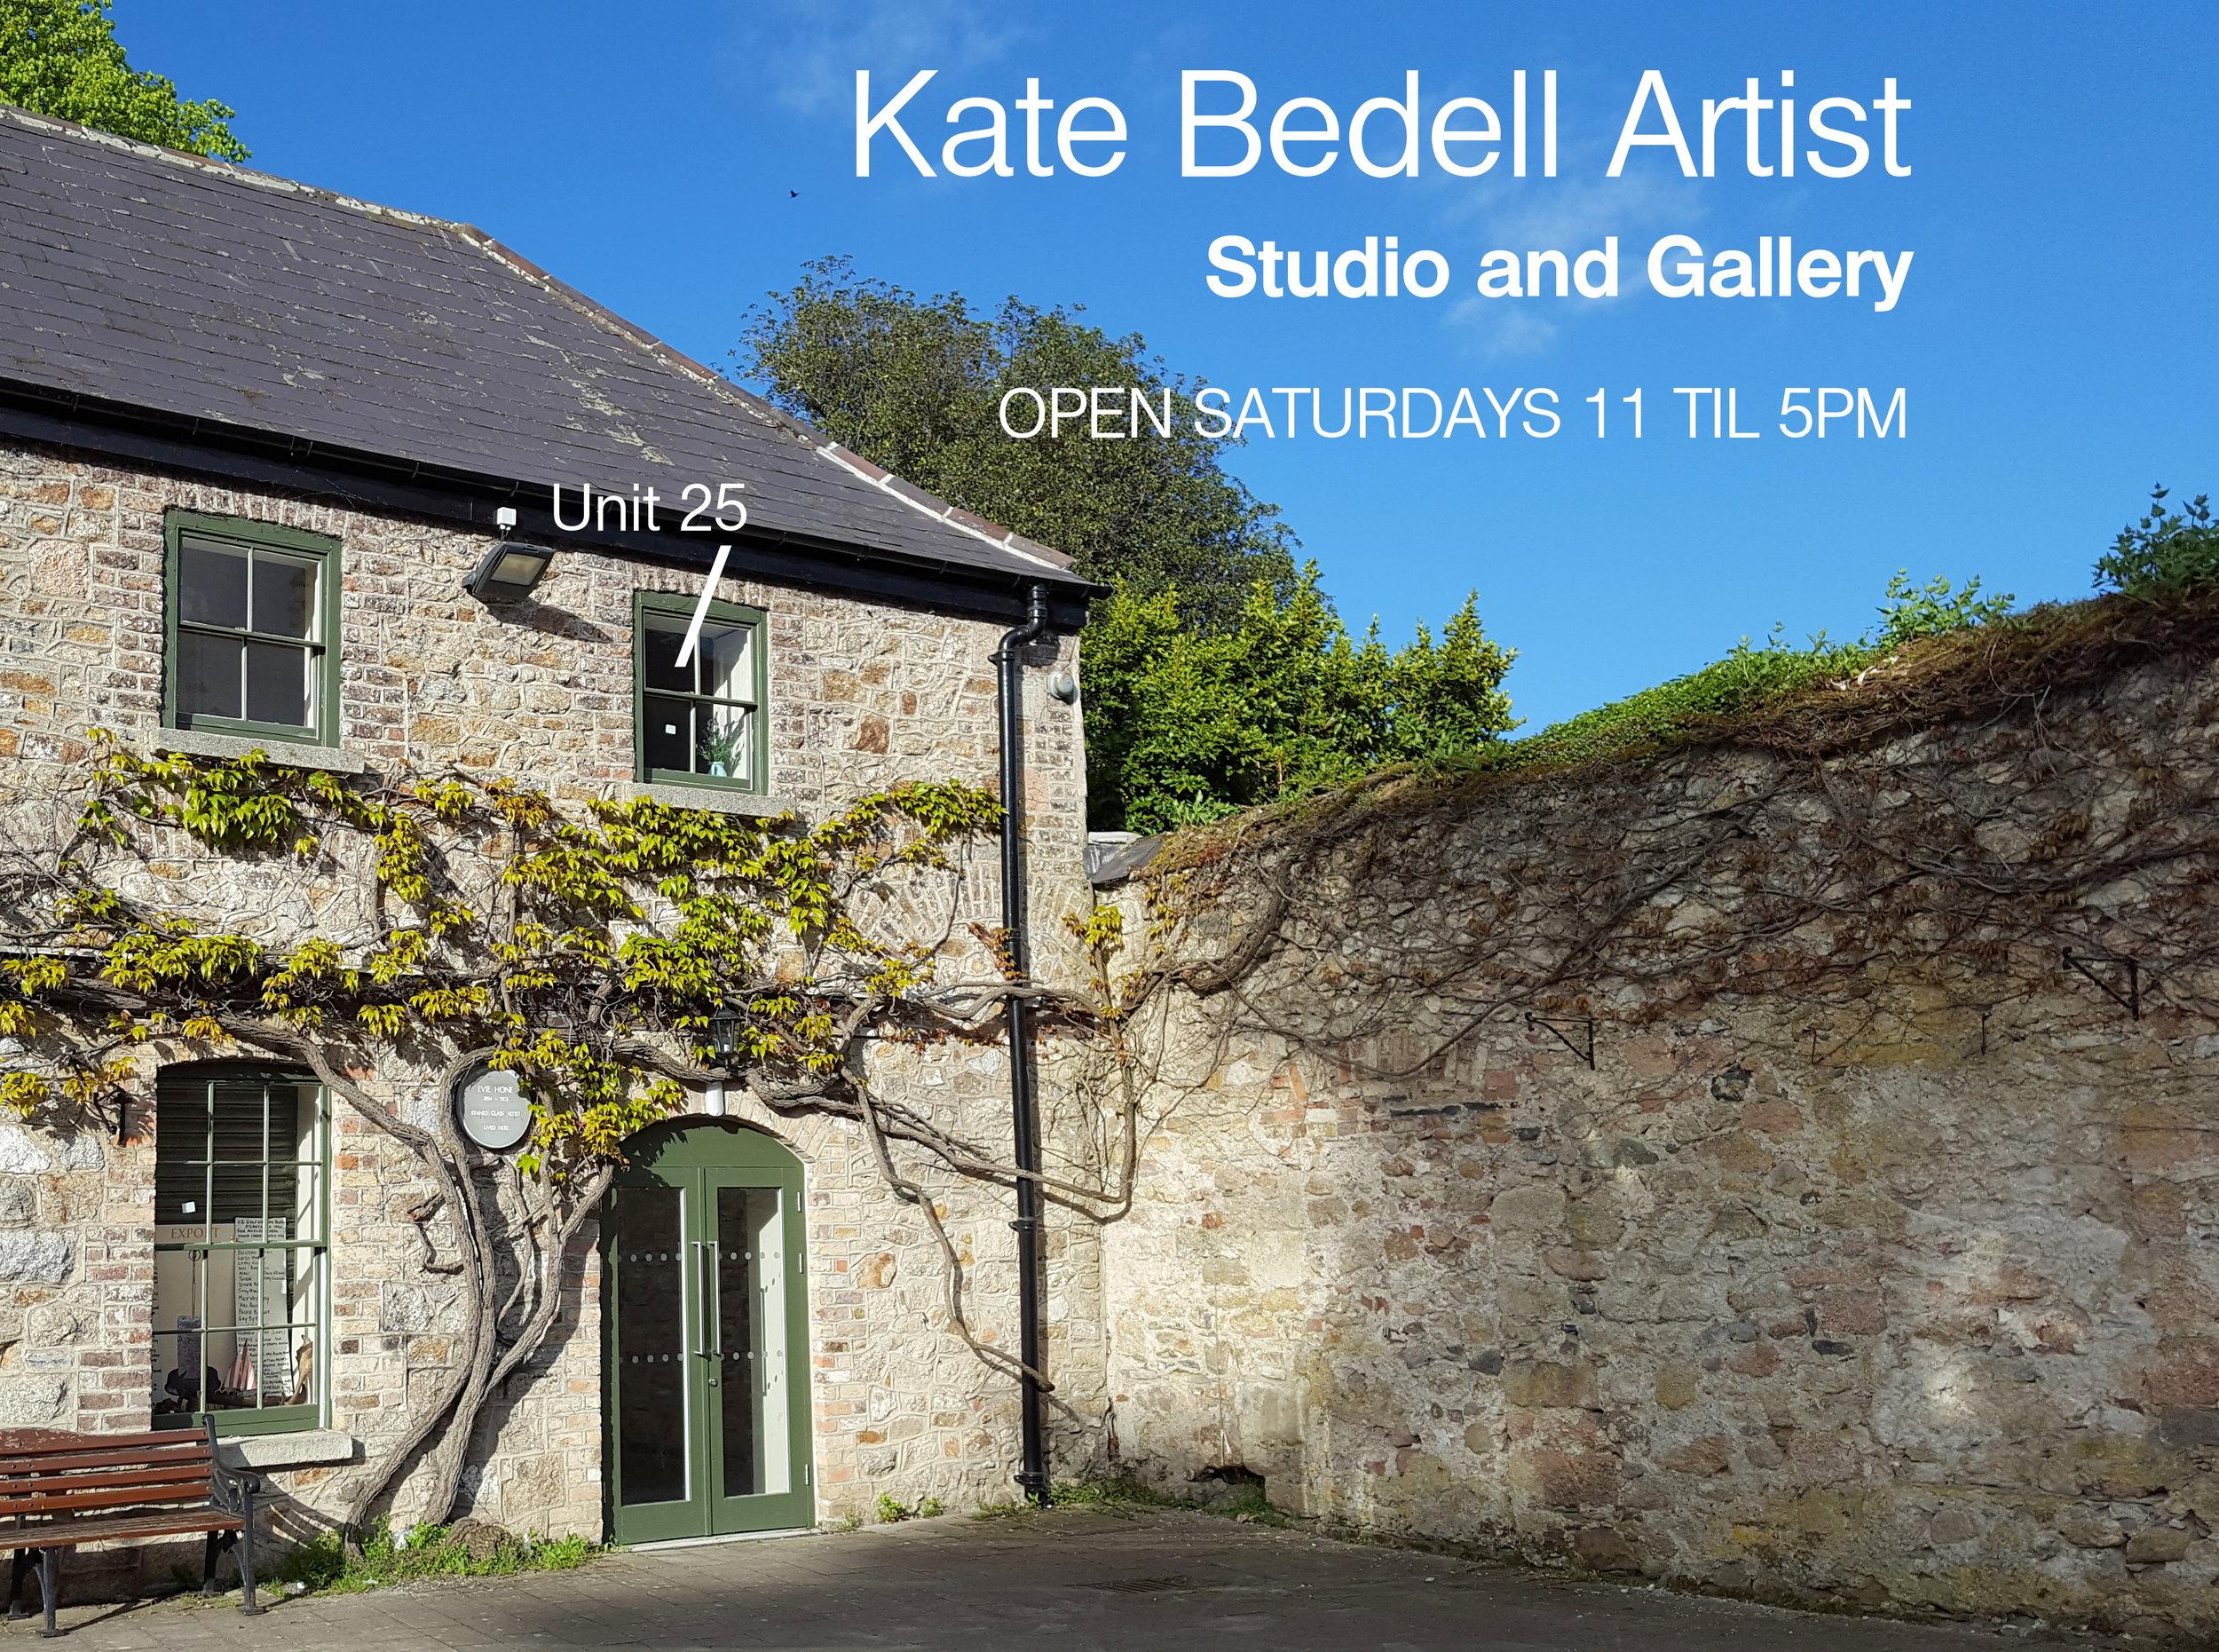 Kate Bedell Artist, Unit 25, Marlay Craft Courtyard at Marlay Park